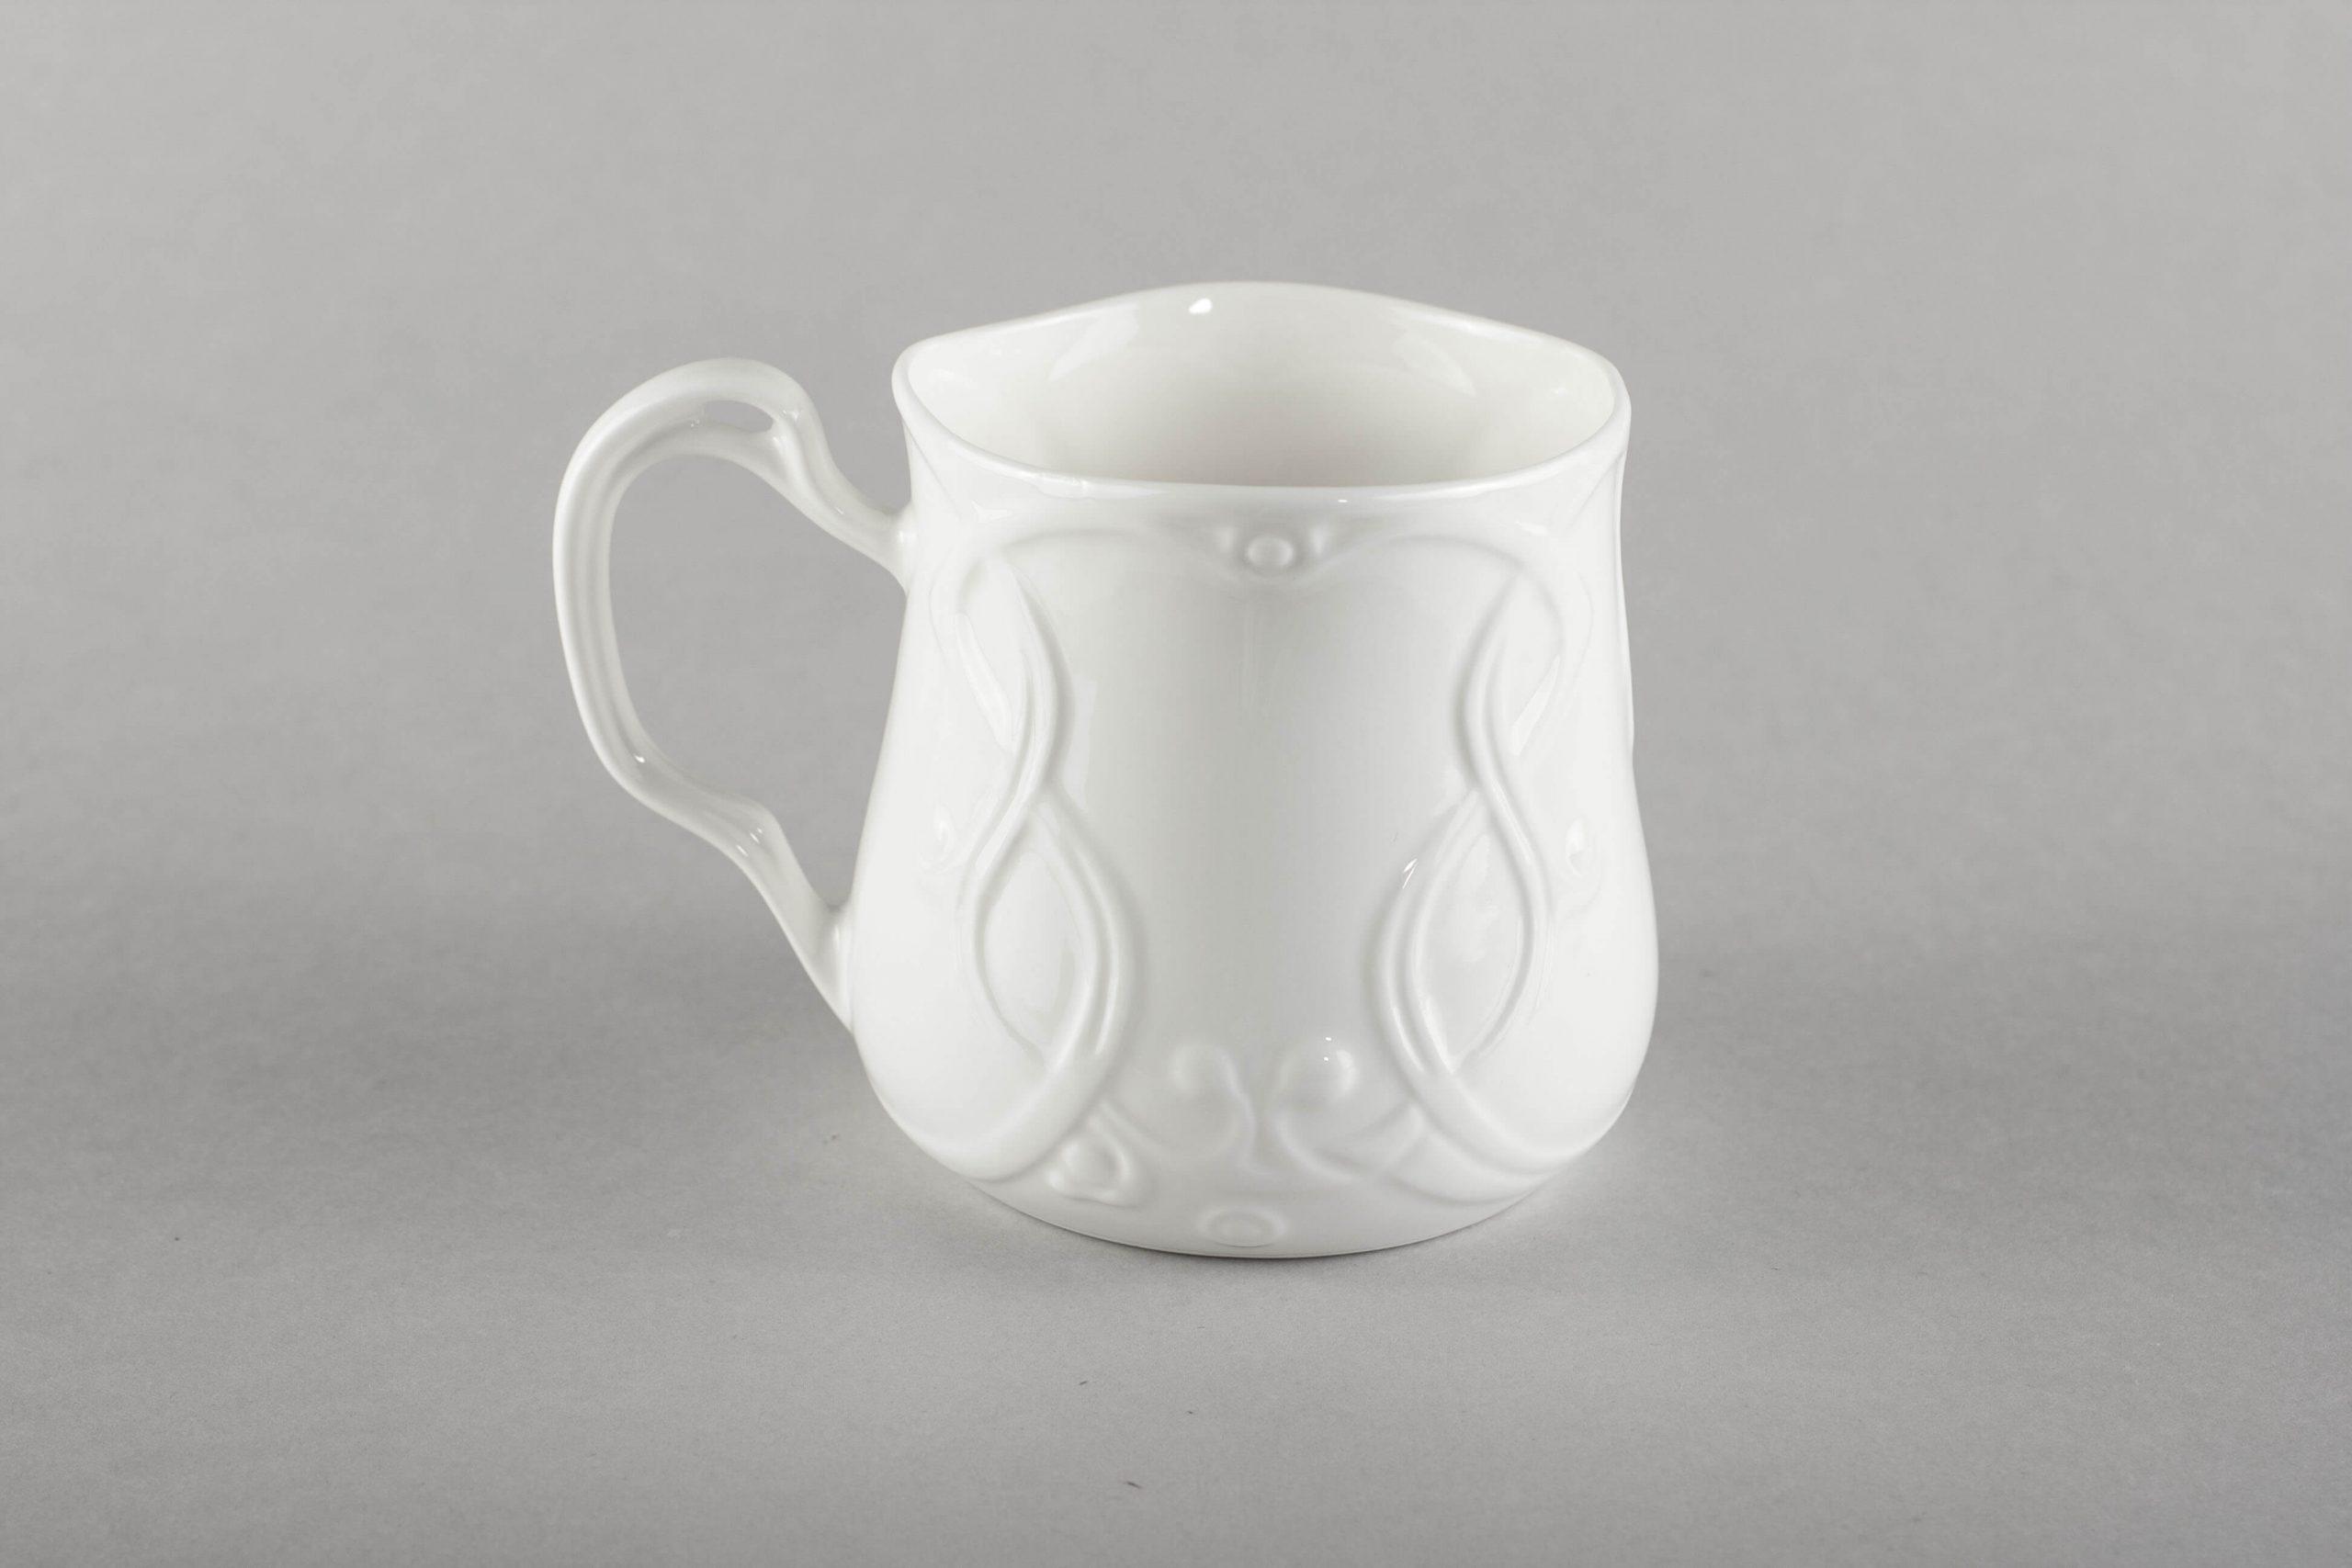 Piebalgas porcelain baltic design 2 scaled Piebalga Porcelain